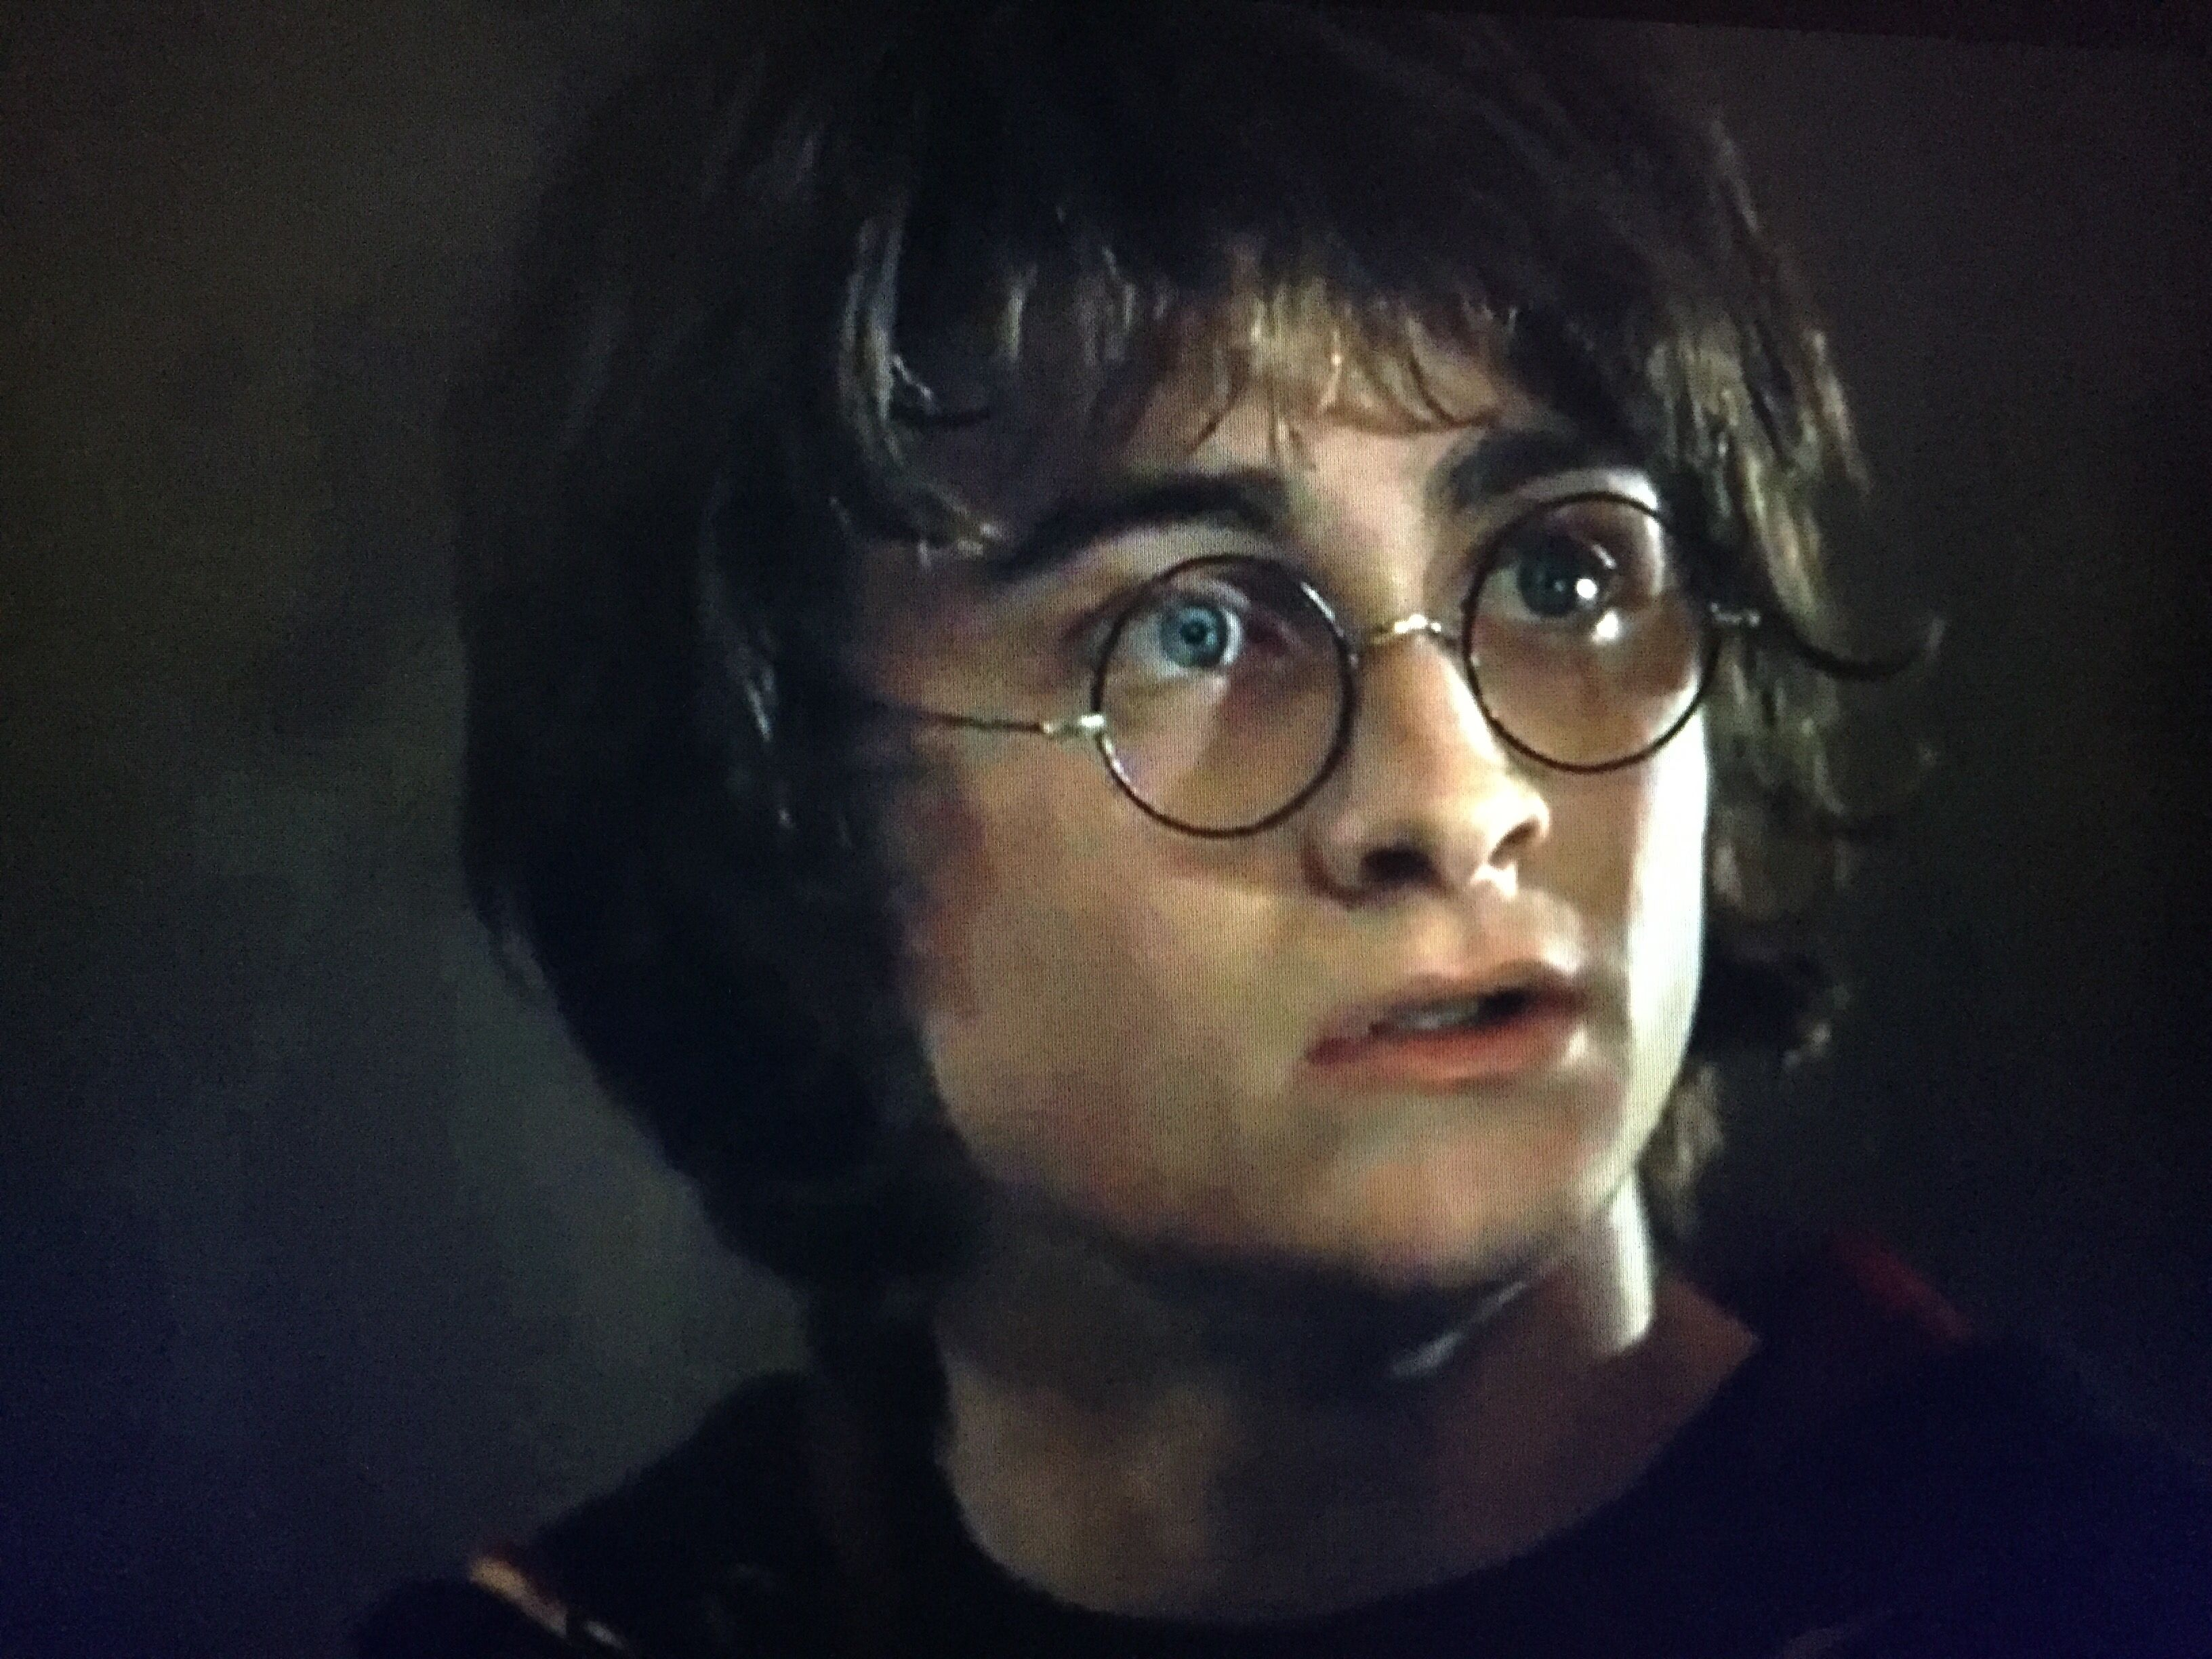 Pin By Majo Salgado On Moremoreharrypotter Harry Potter Pictures Harry Potter Films Harry Potter Movies